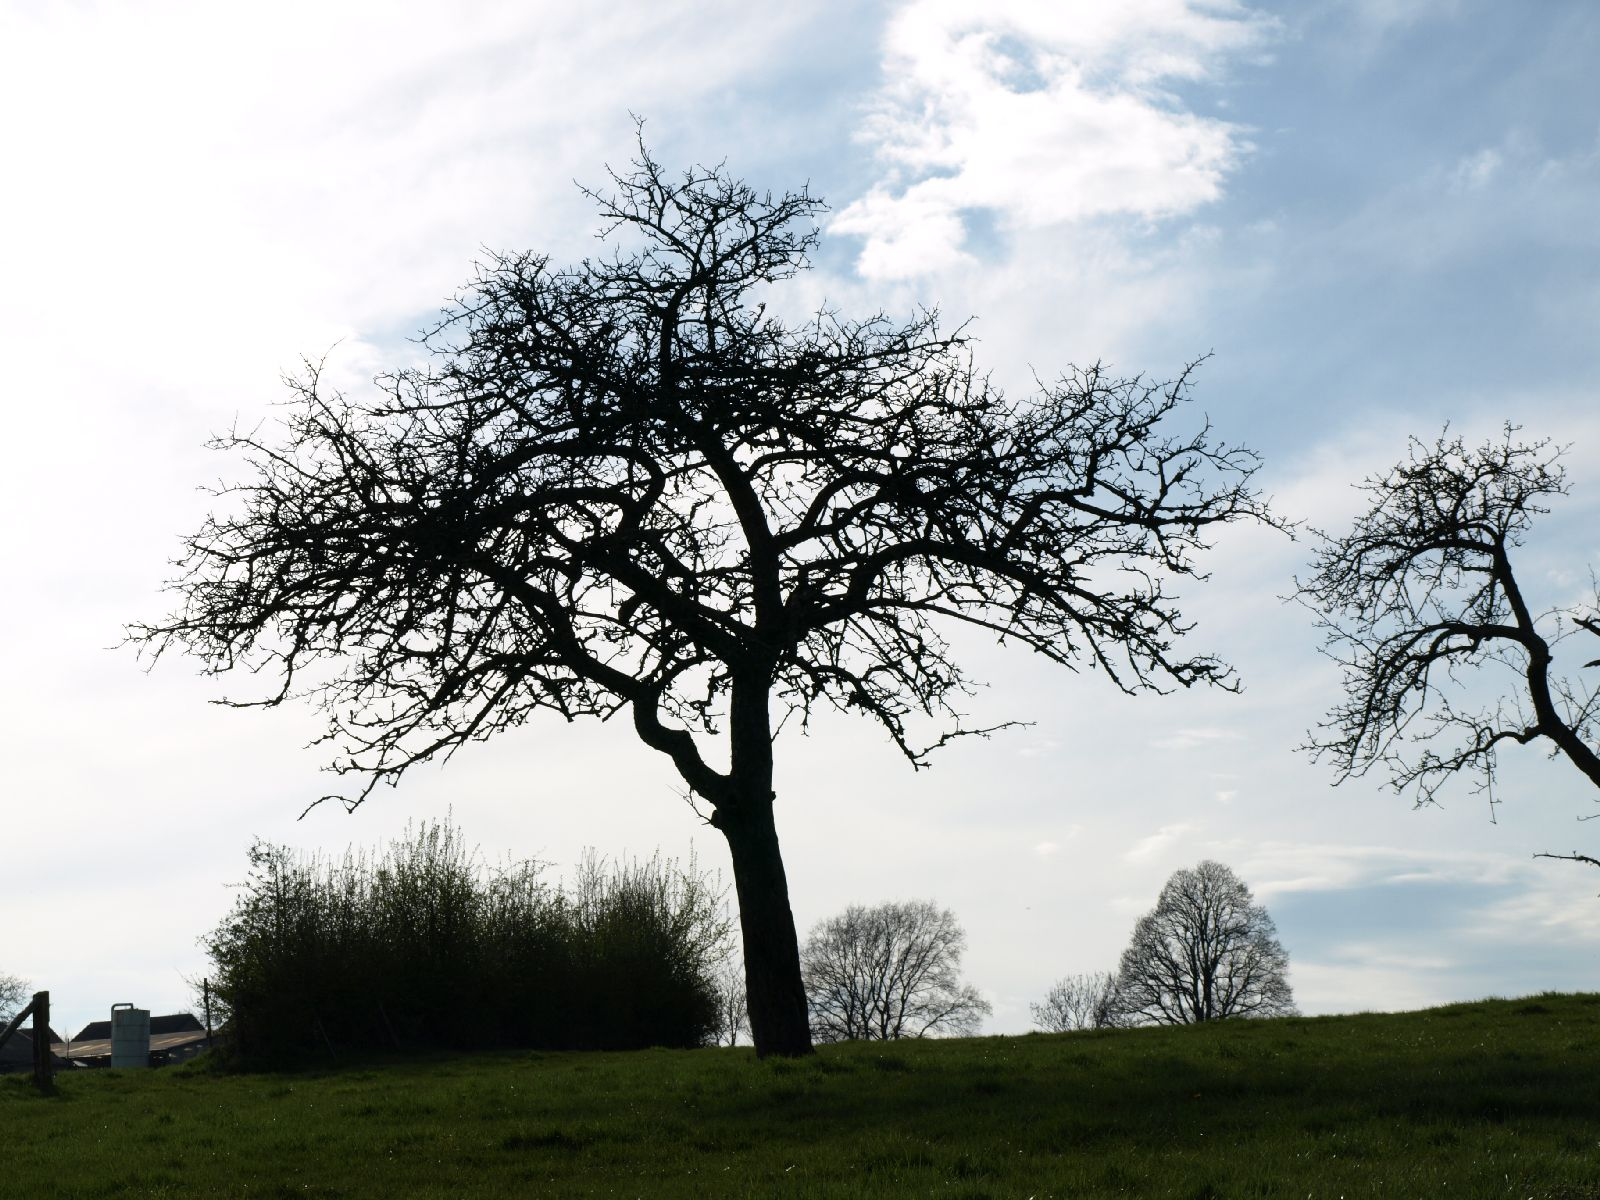 Pflanzen-Baum-Silhouette-Foto_Textur_B_P4201545